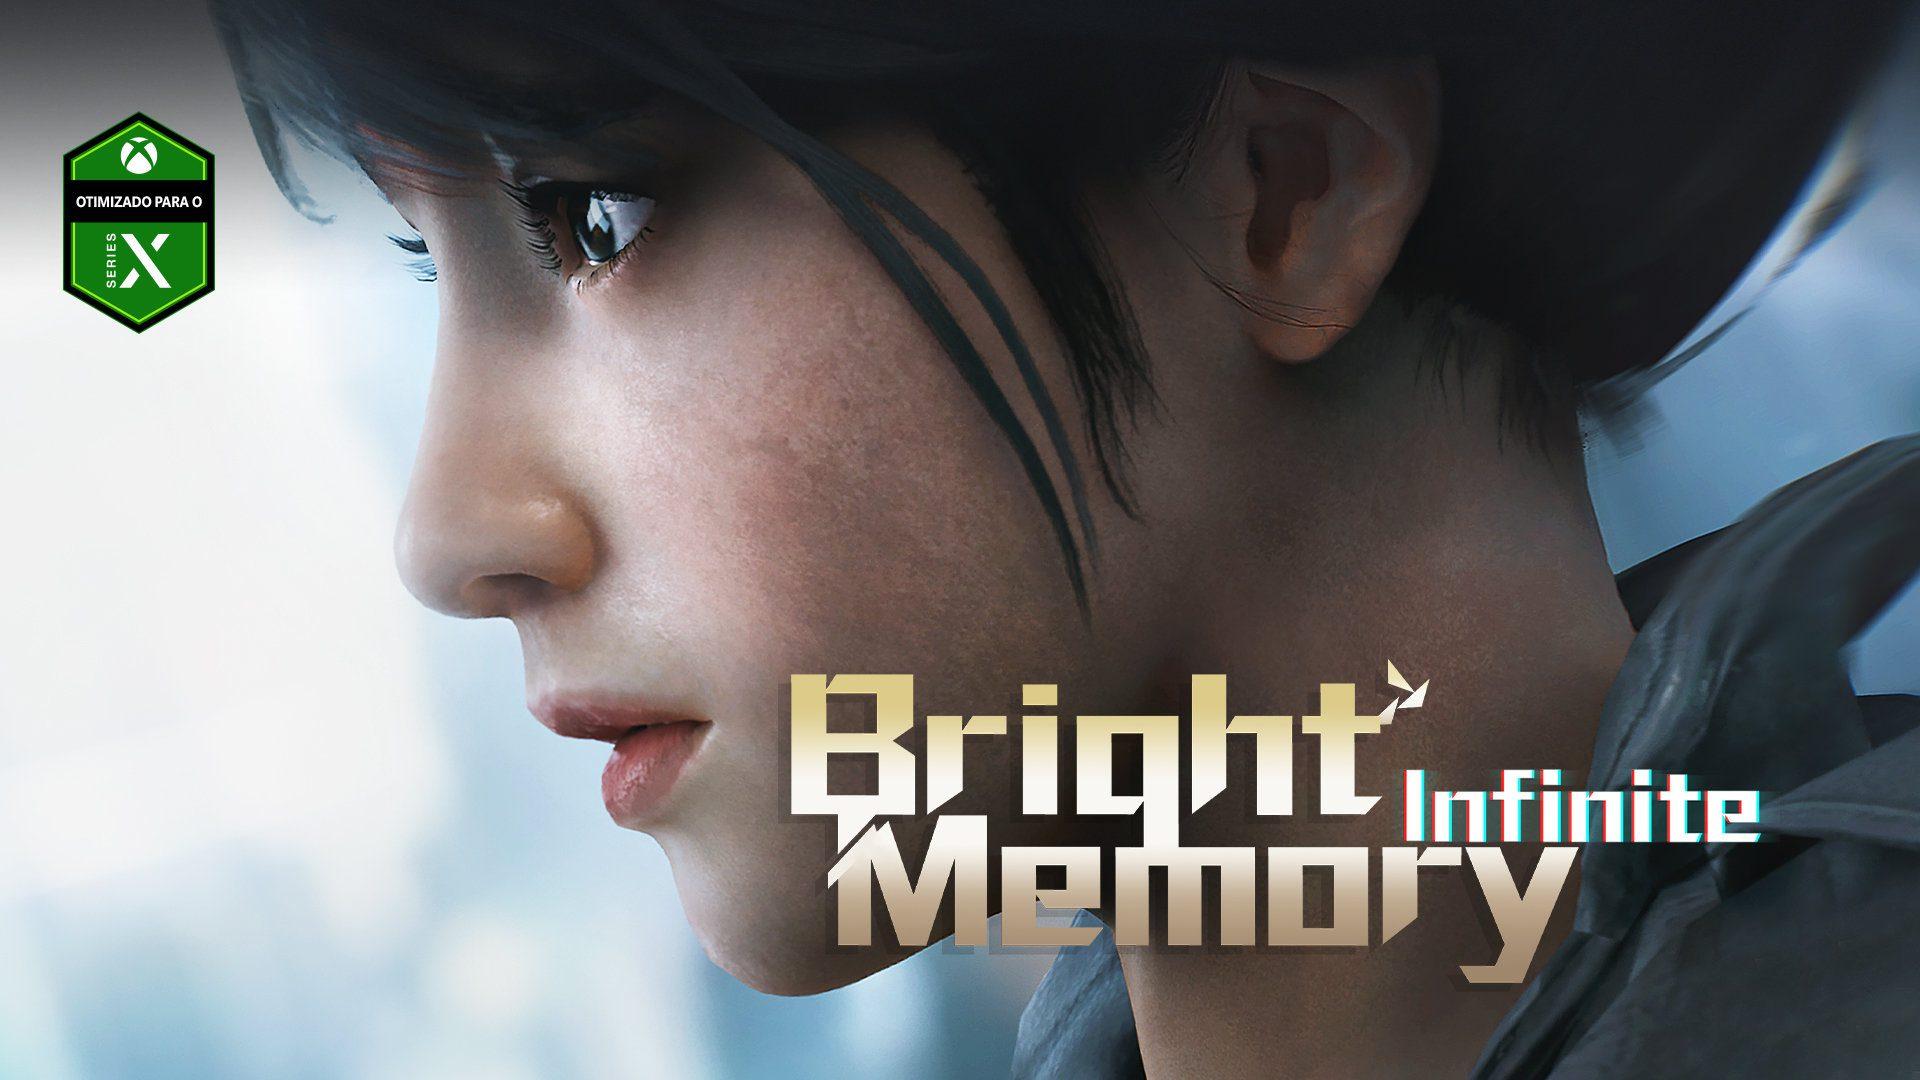 Bright Memory: Infinite Releases New Trailer for Gamescom